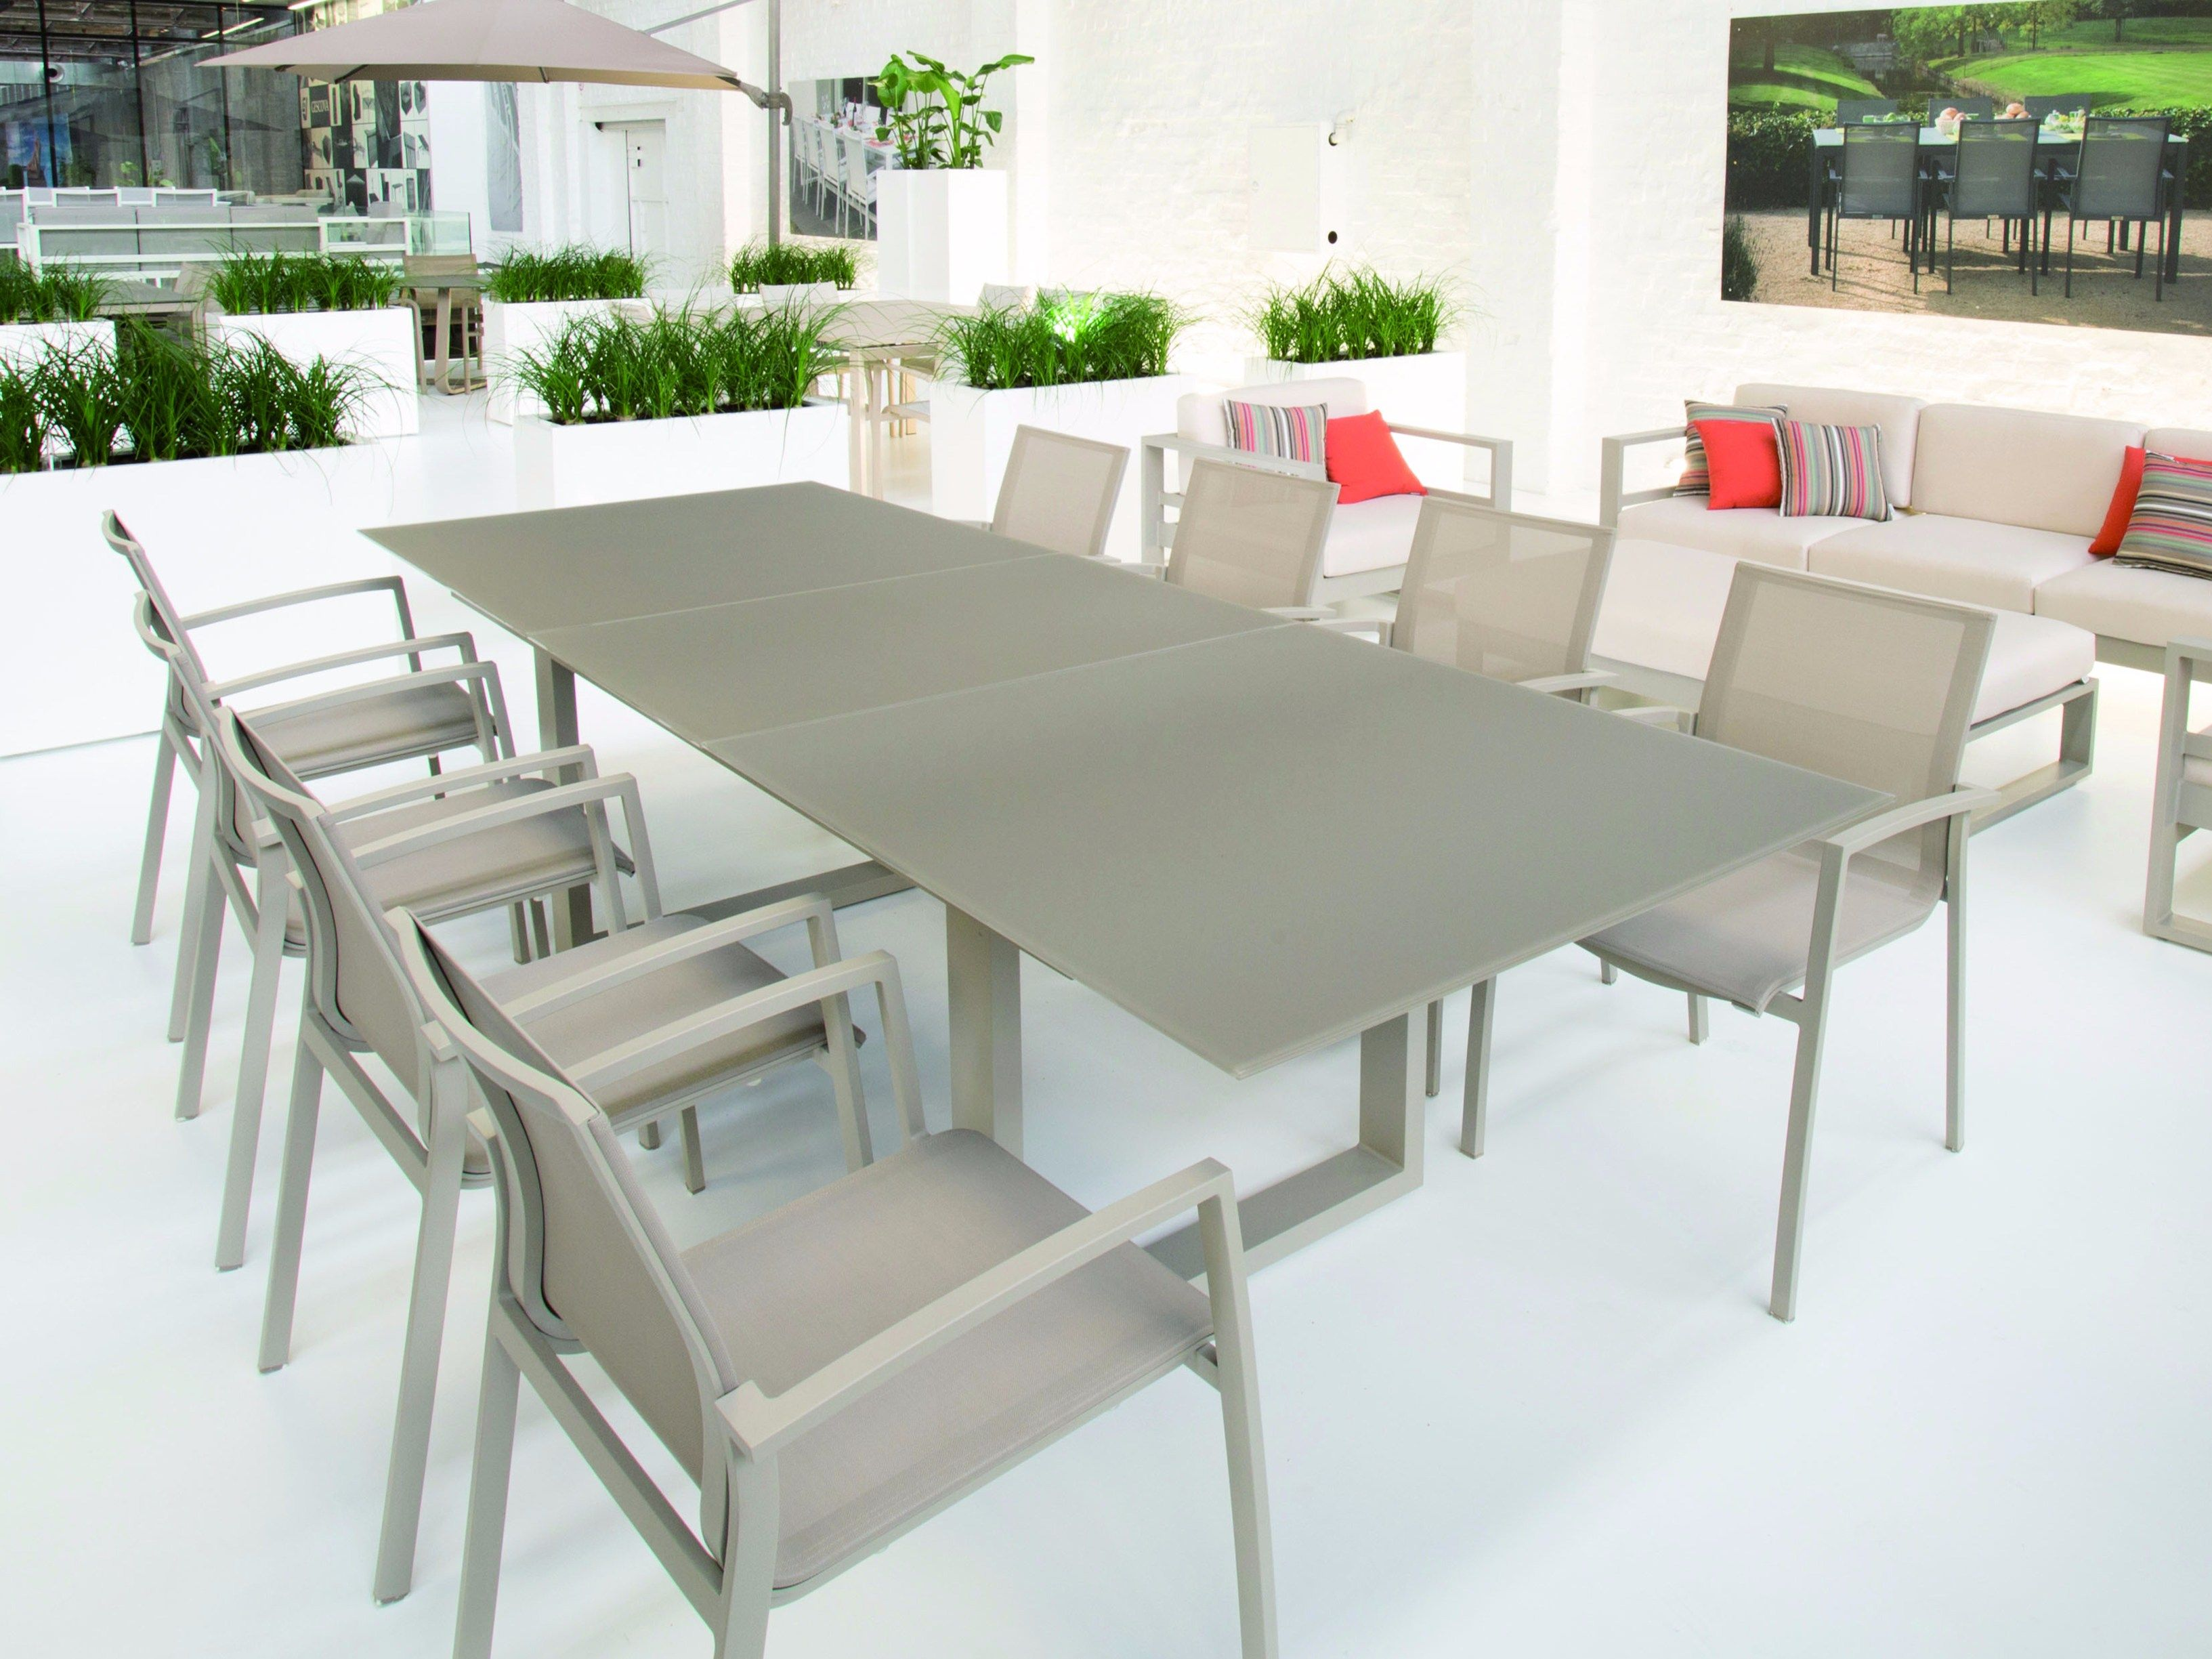 81fb1c5b617fc4efa97c240caa62a1a4 Frais De Table Exterieur Aluminium Schème